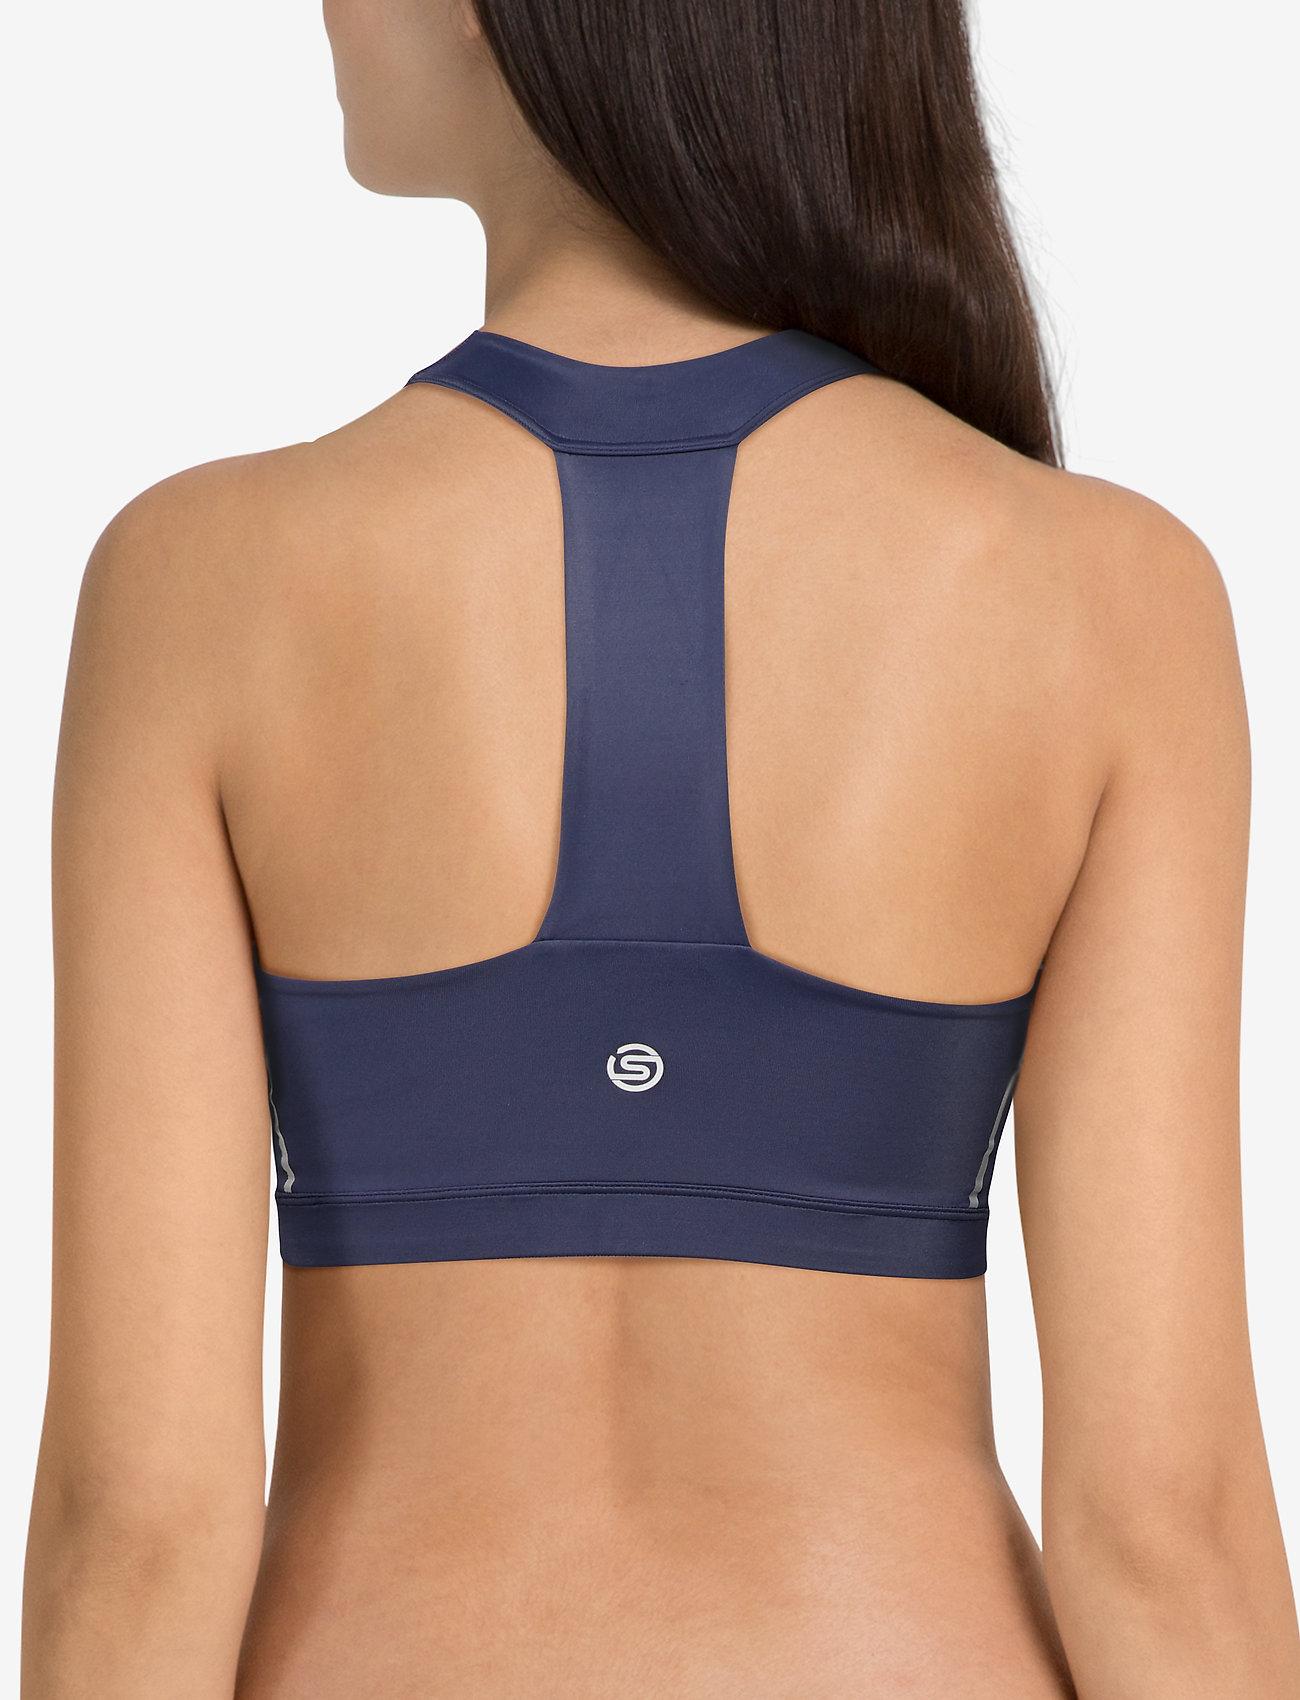 Skins DNAmic Speed Womens Sports Bra - NAVY BLUE